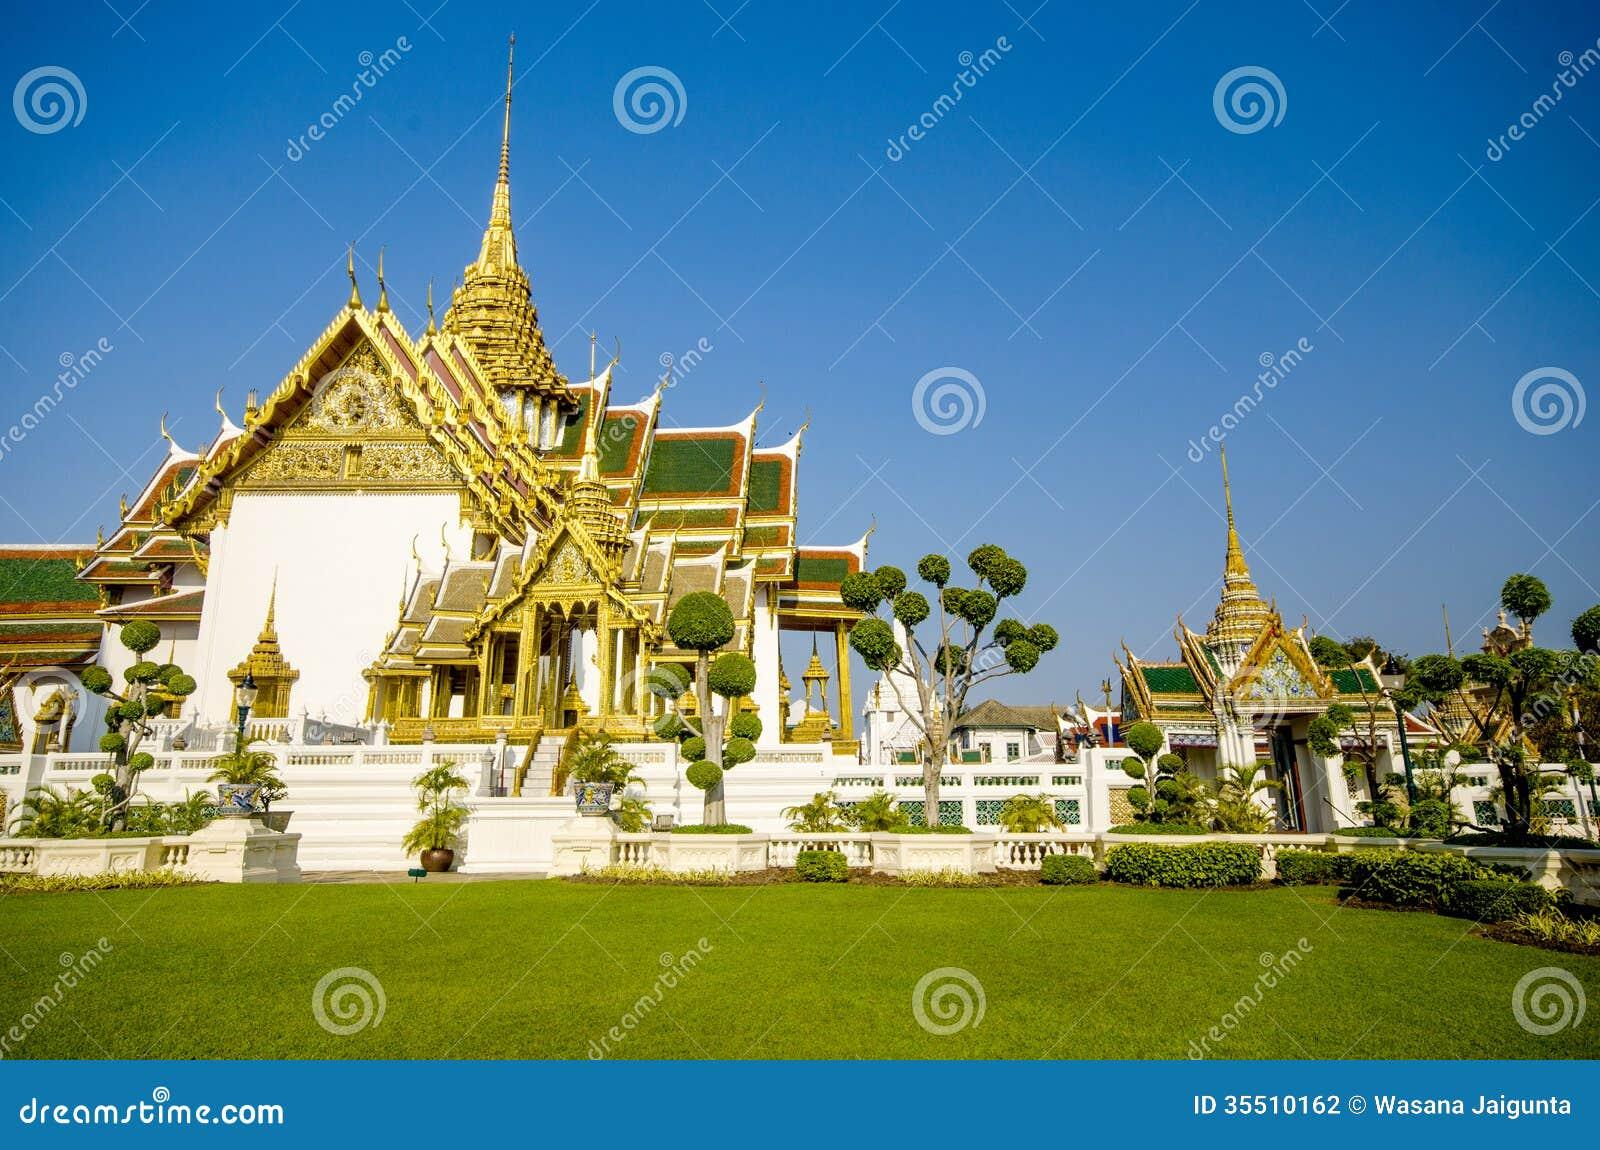 Dusit Maha Prasat Throne Hall σε Wat Phra Kaew, Μπανγκόκ, Ταϊλάνδη